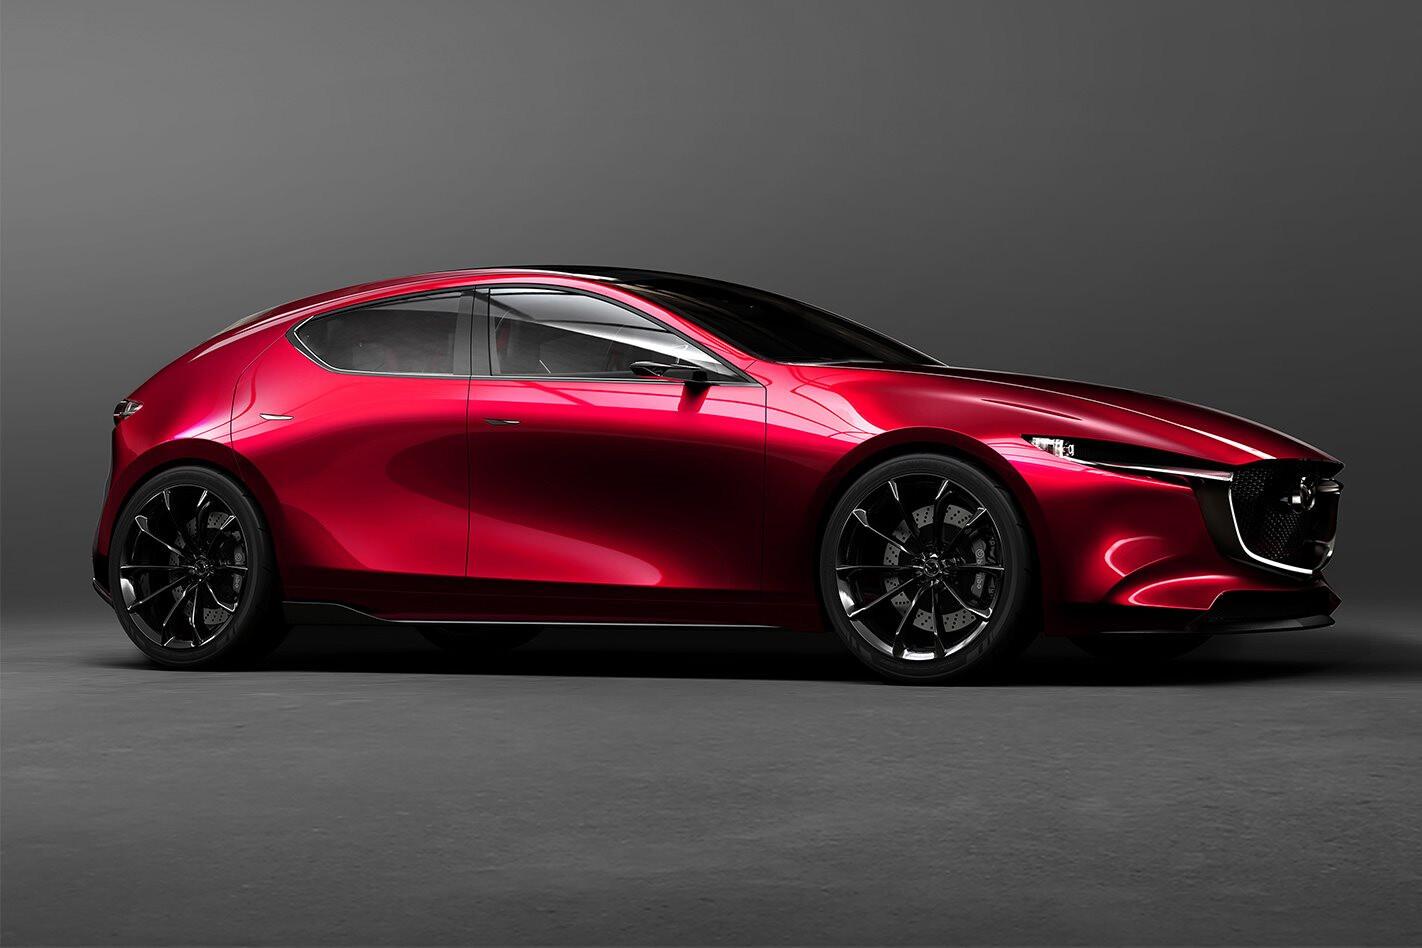 Mazda Kai concept unveiled, next-gen Mazda 3 previewed